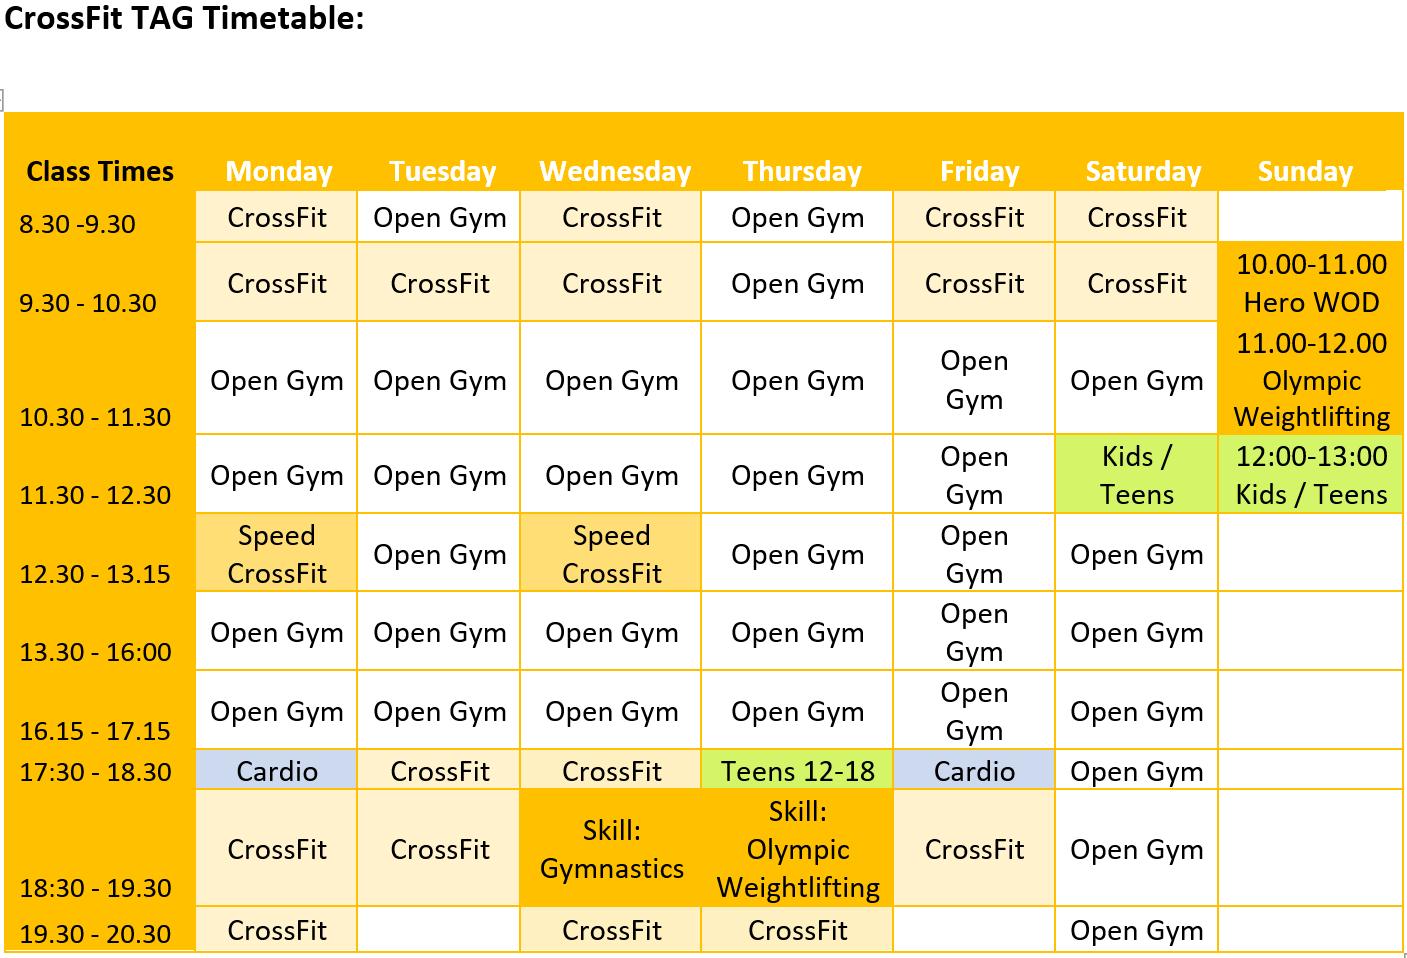 Sevenoaks CrossFit Timetabke